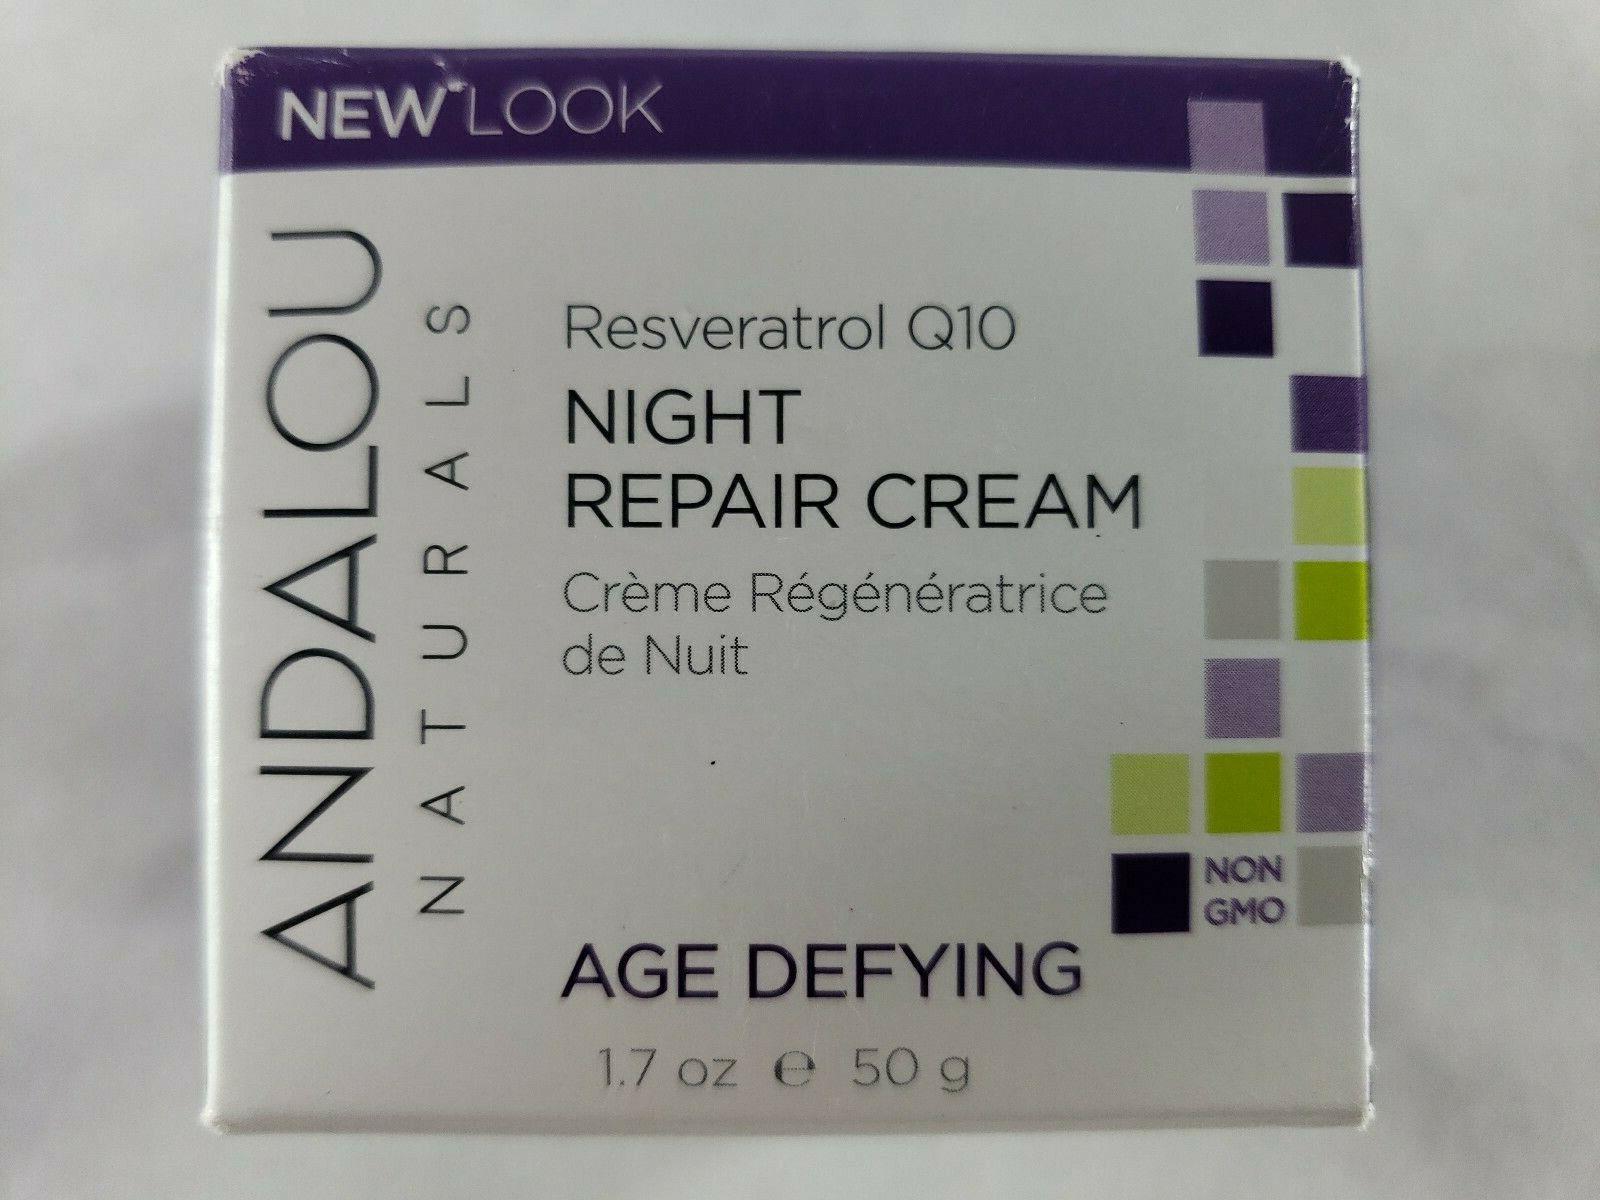 Andalou Naturals Resveratrol Q10 Night Repair Cream, 1.7 Oun